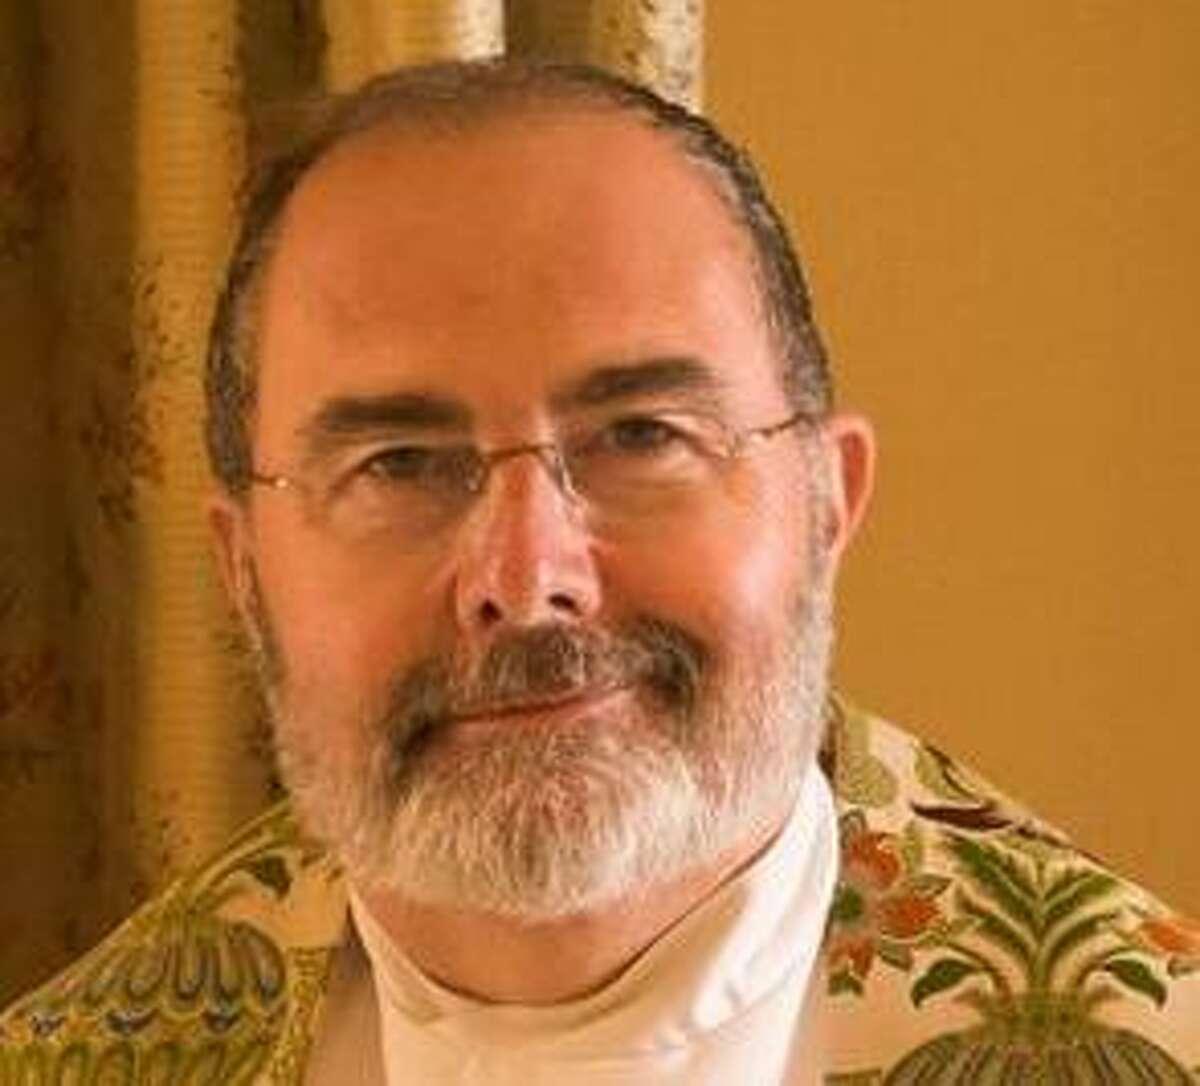 The Reverend Nicholas G. Lang